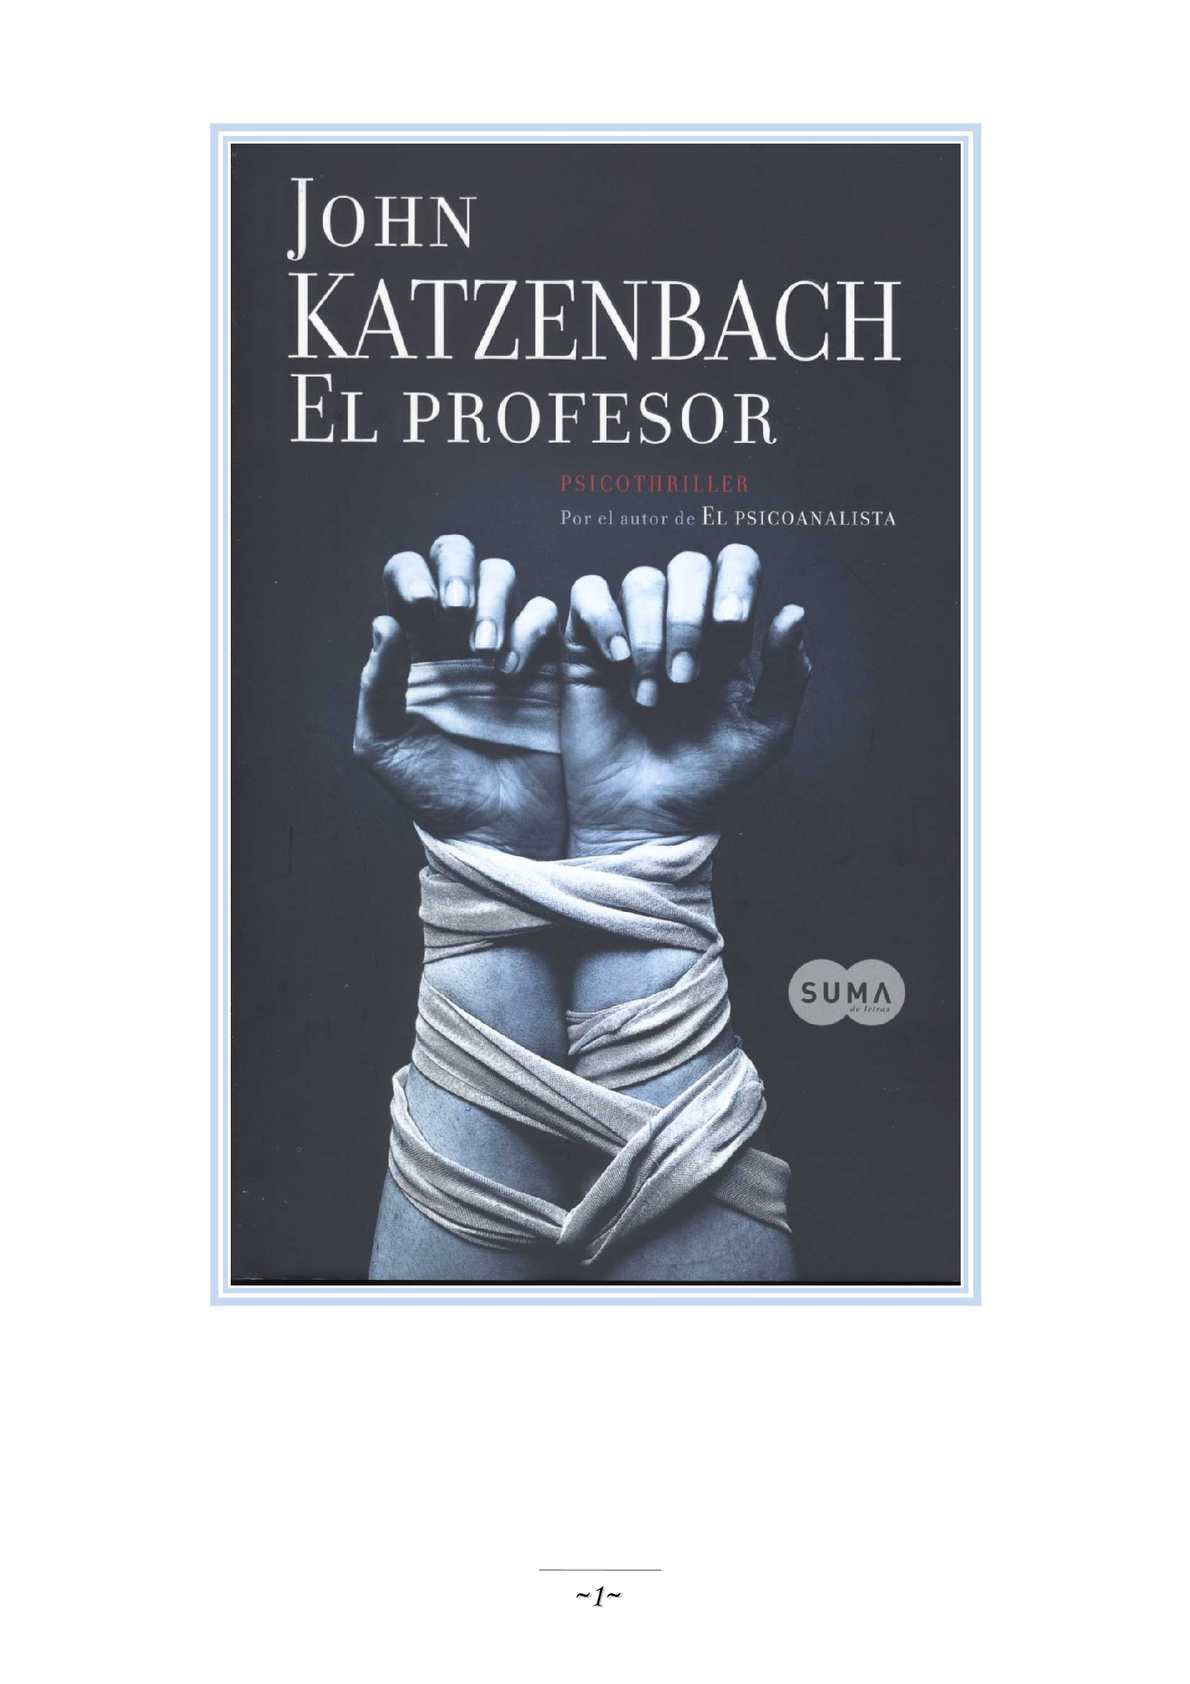 Calaméo - El Profesor John Katzenbach